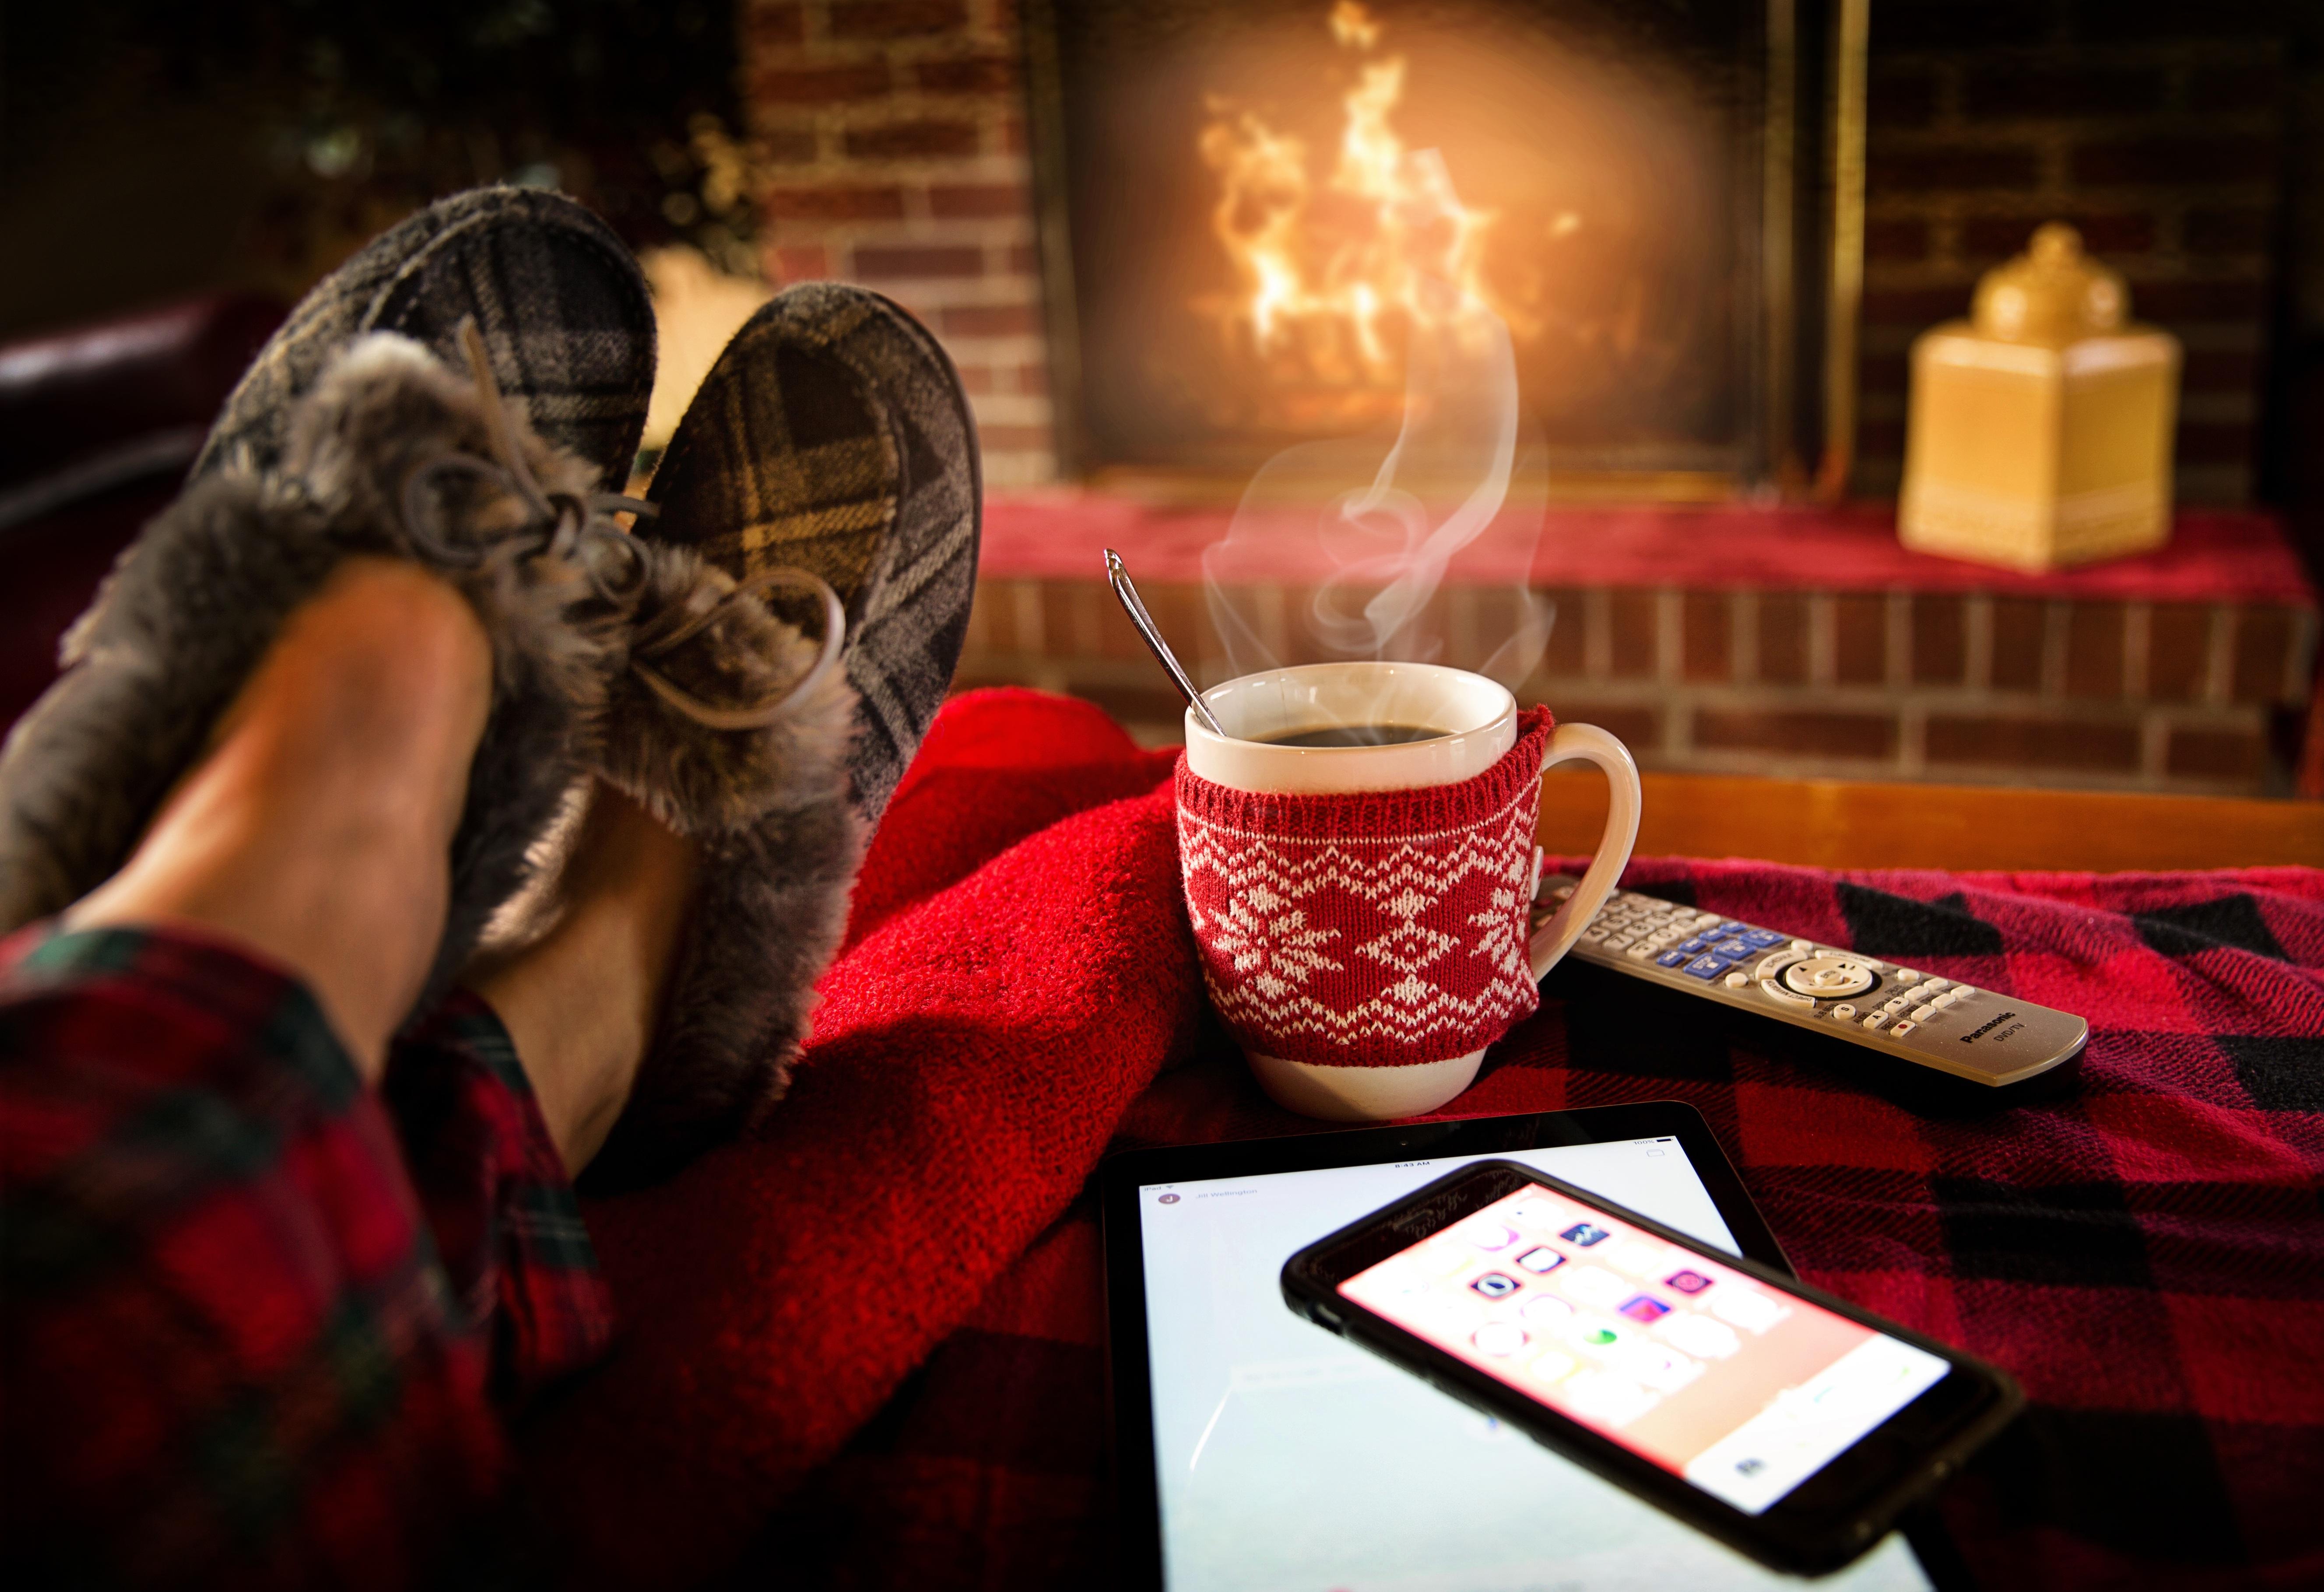 Wordans: Getting through the Winter Warm